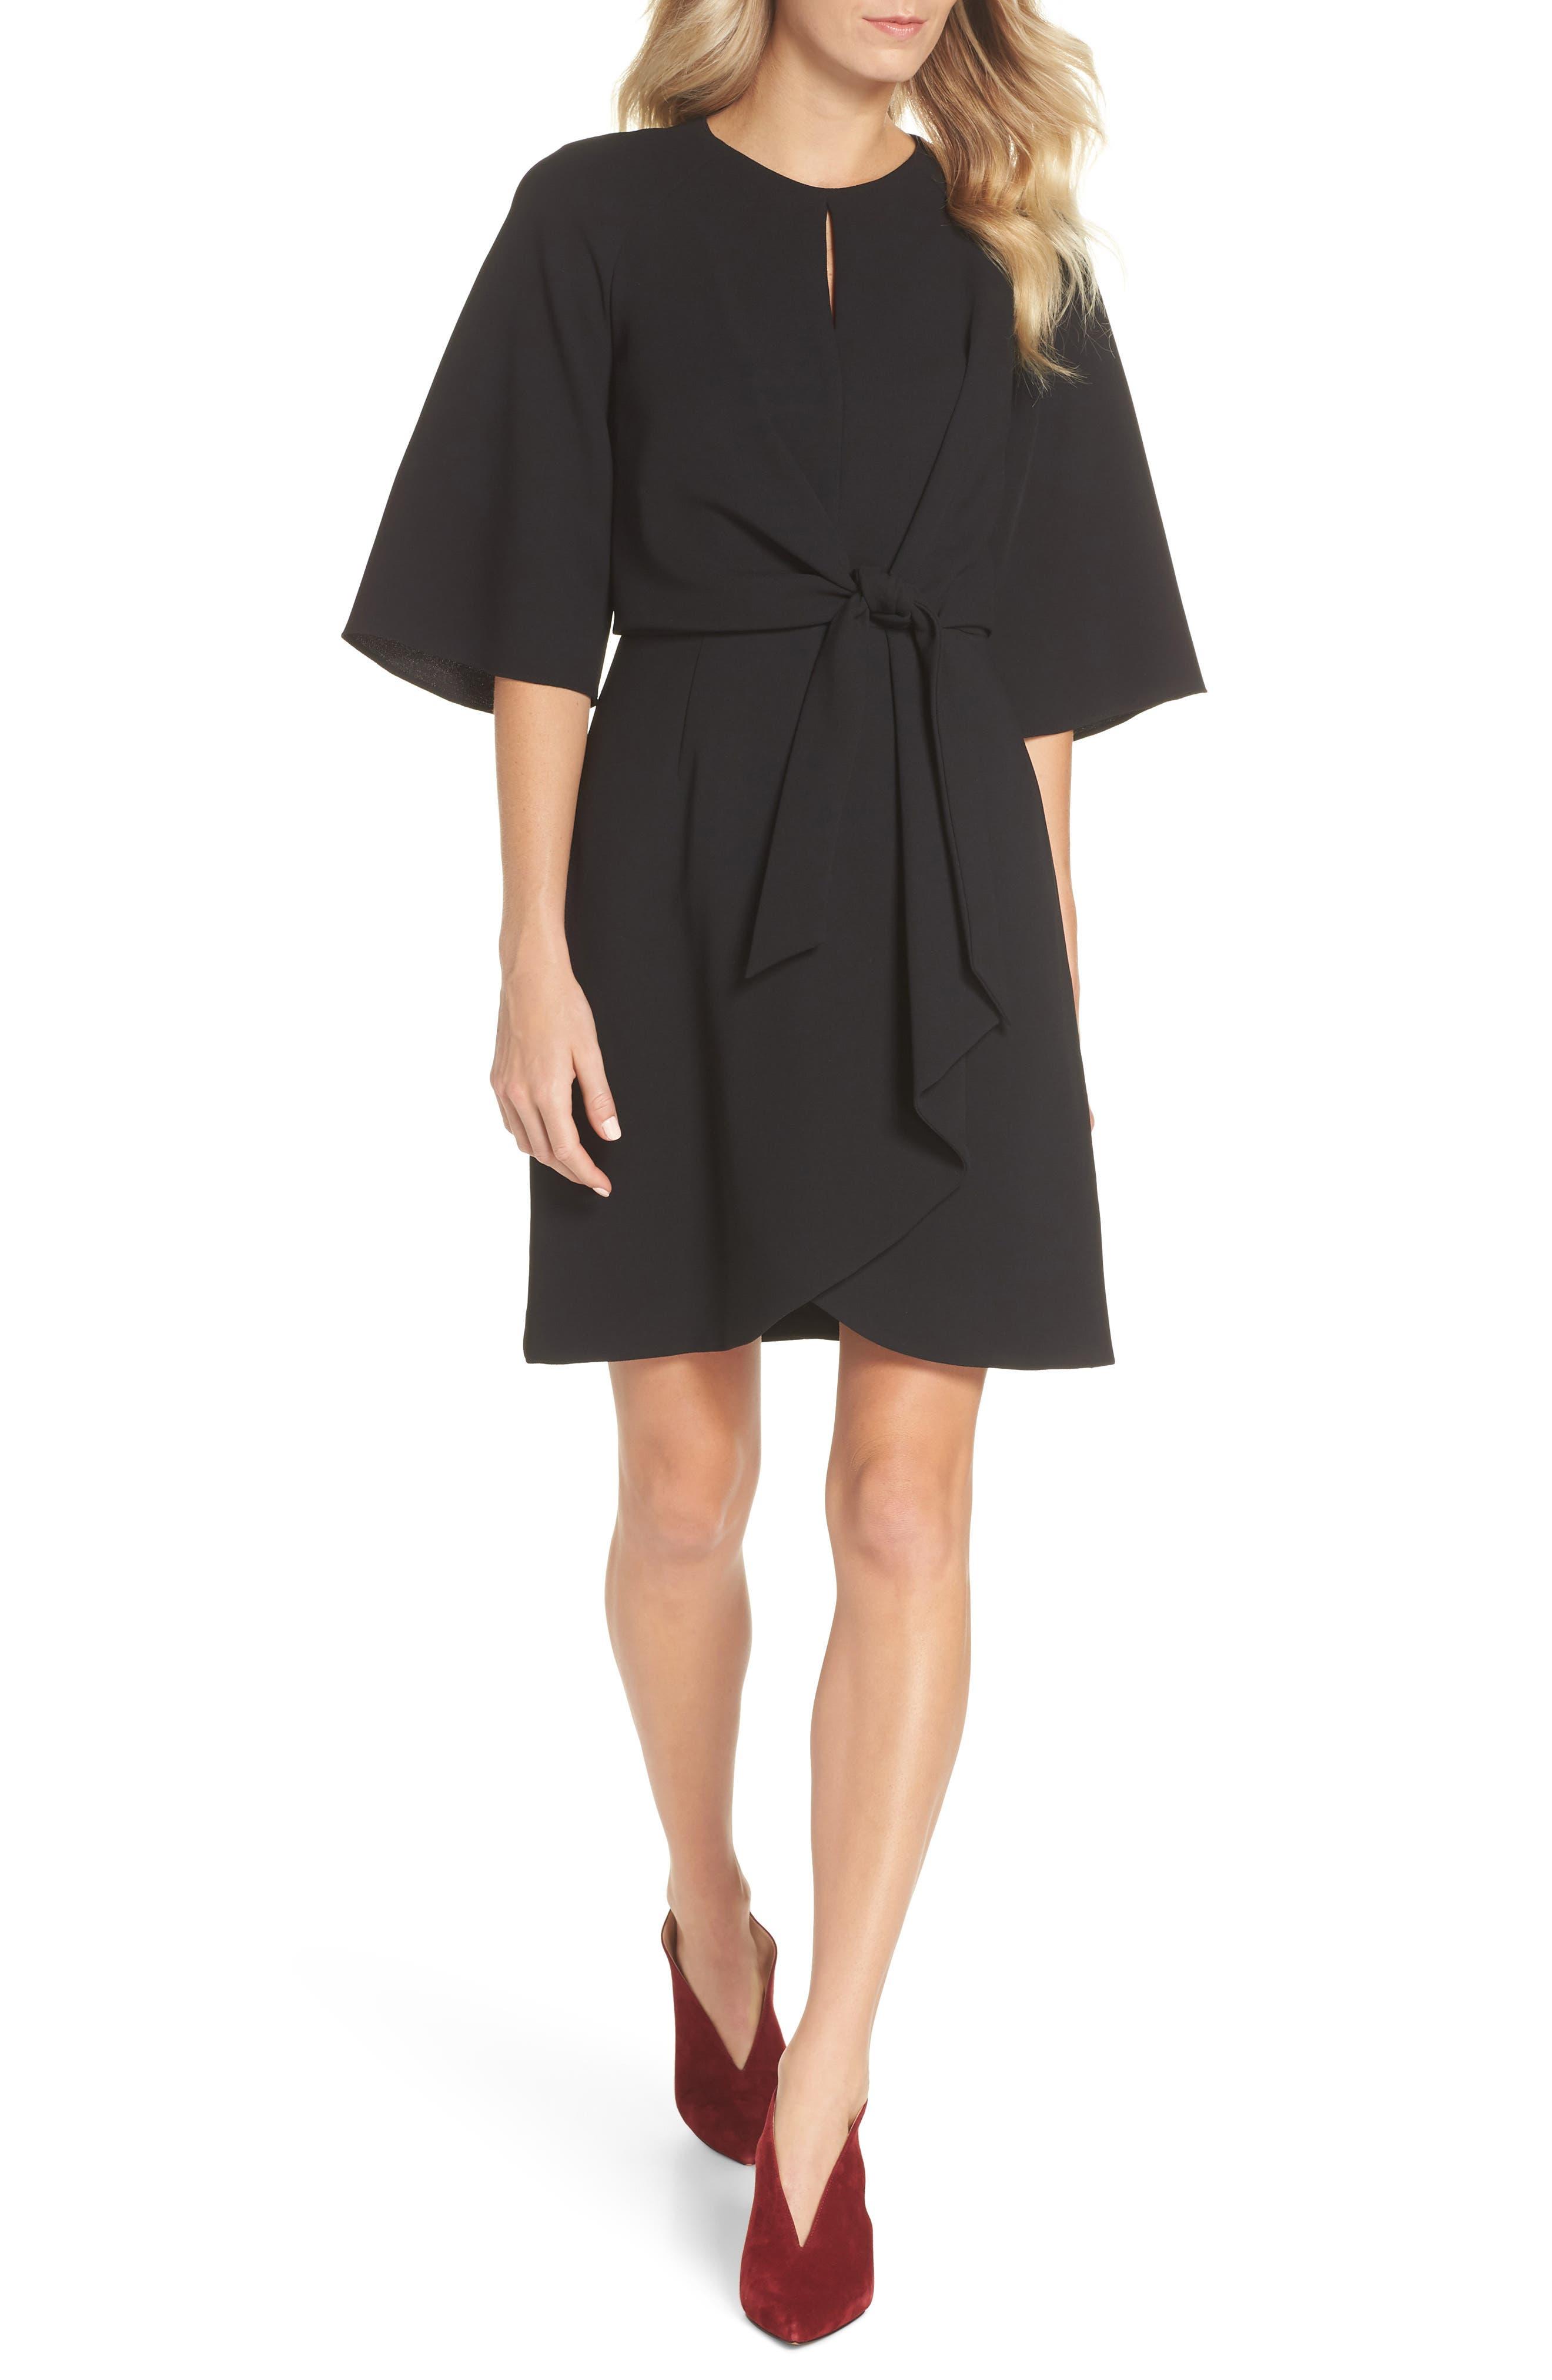 Petite Tahari Tie Front Crepe Sheath Dress, Black